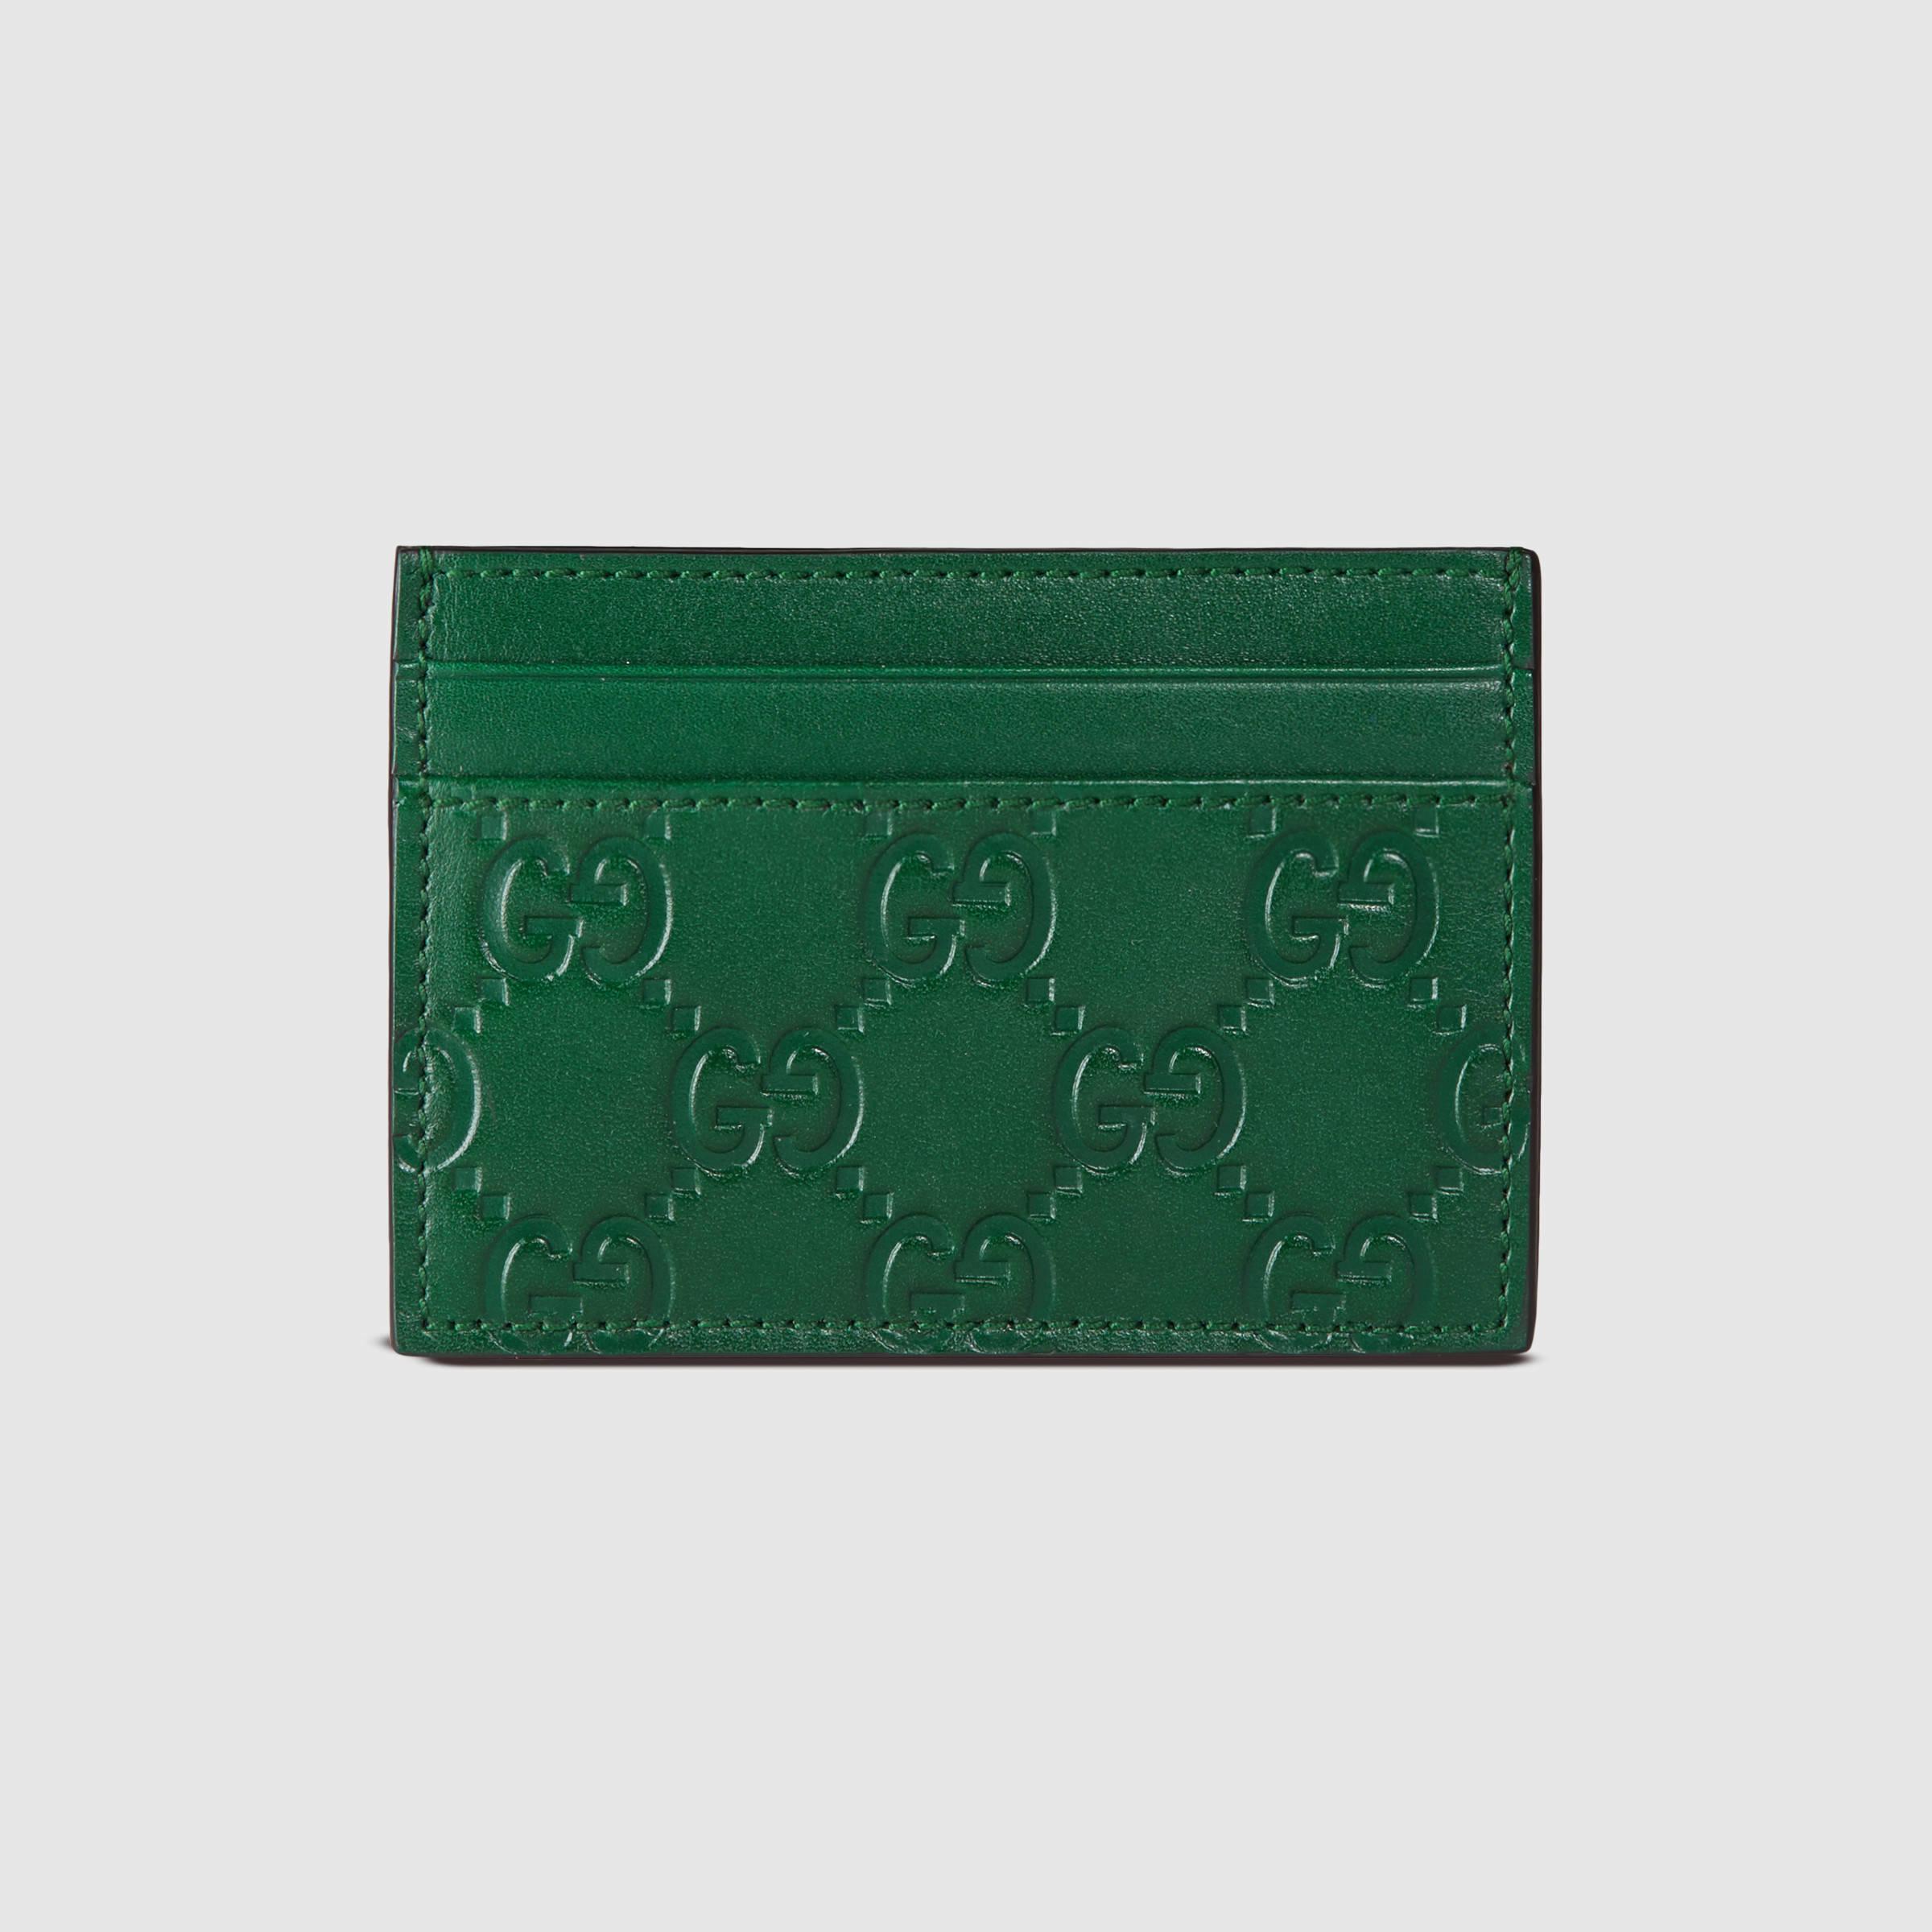 fd77a33cbace Gucci Signature Money Clip in Green for Men - Lyst